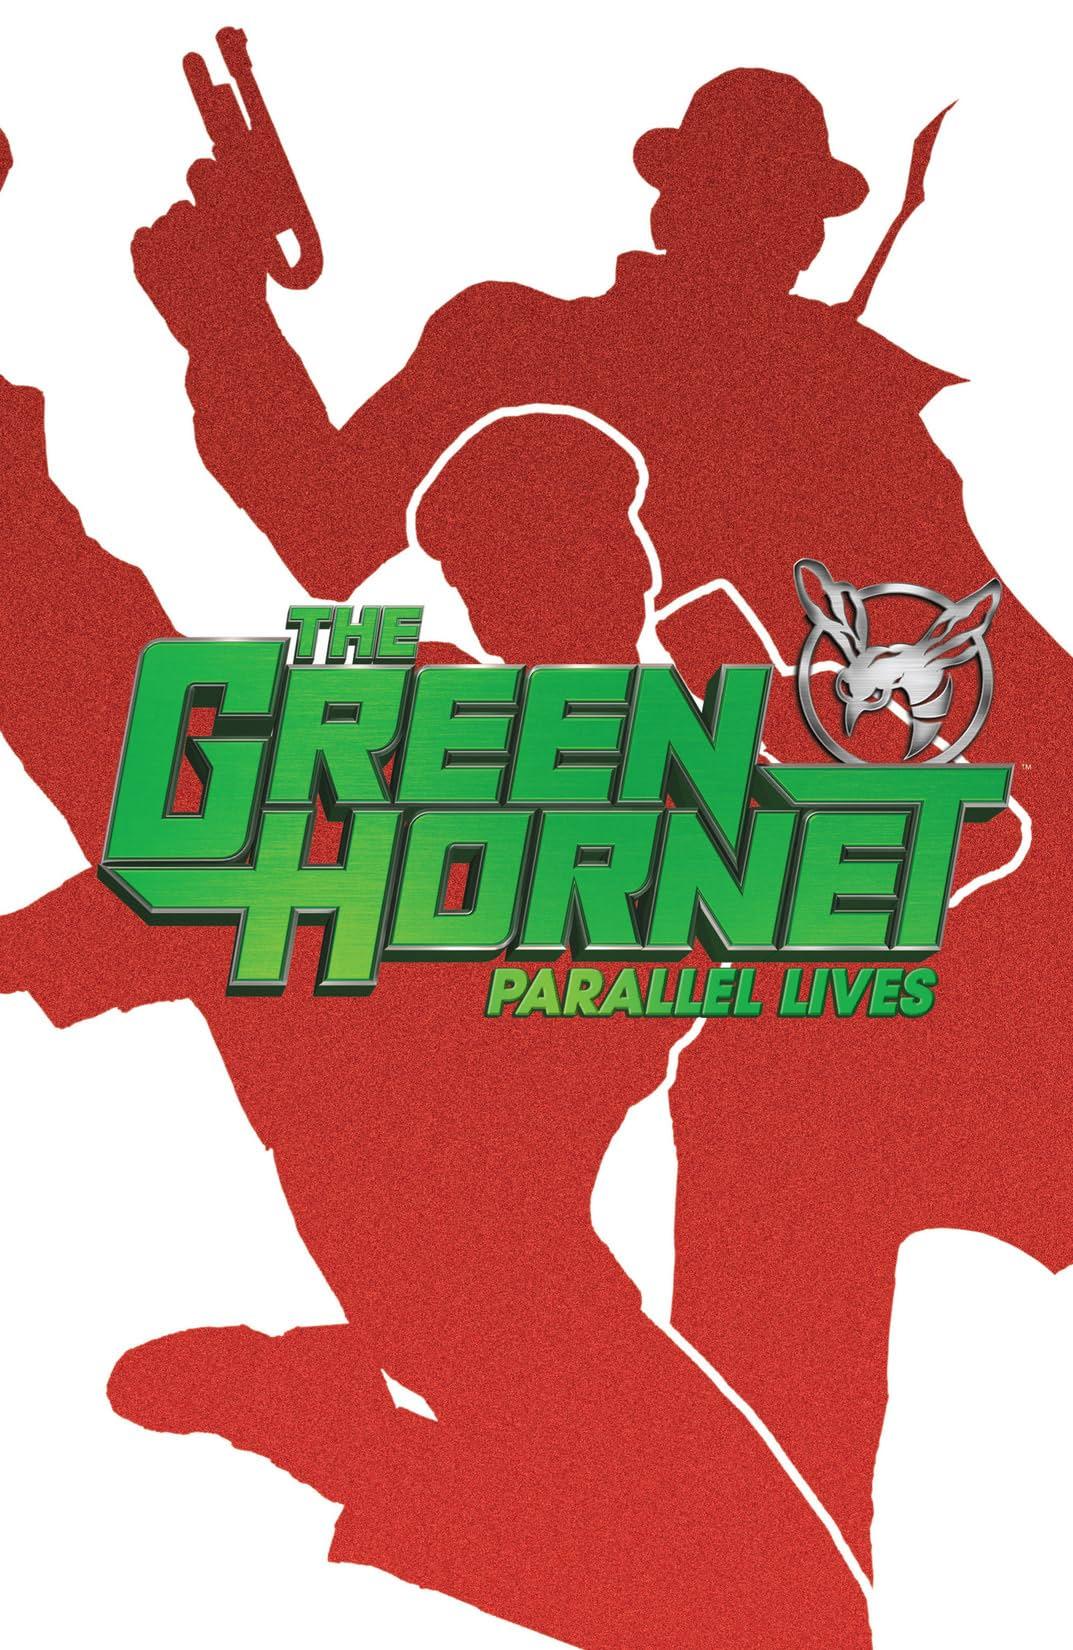 The Green Hornet Strikes! Vol. 1